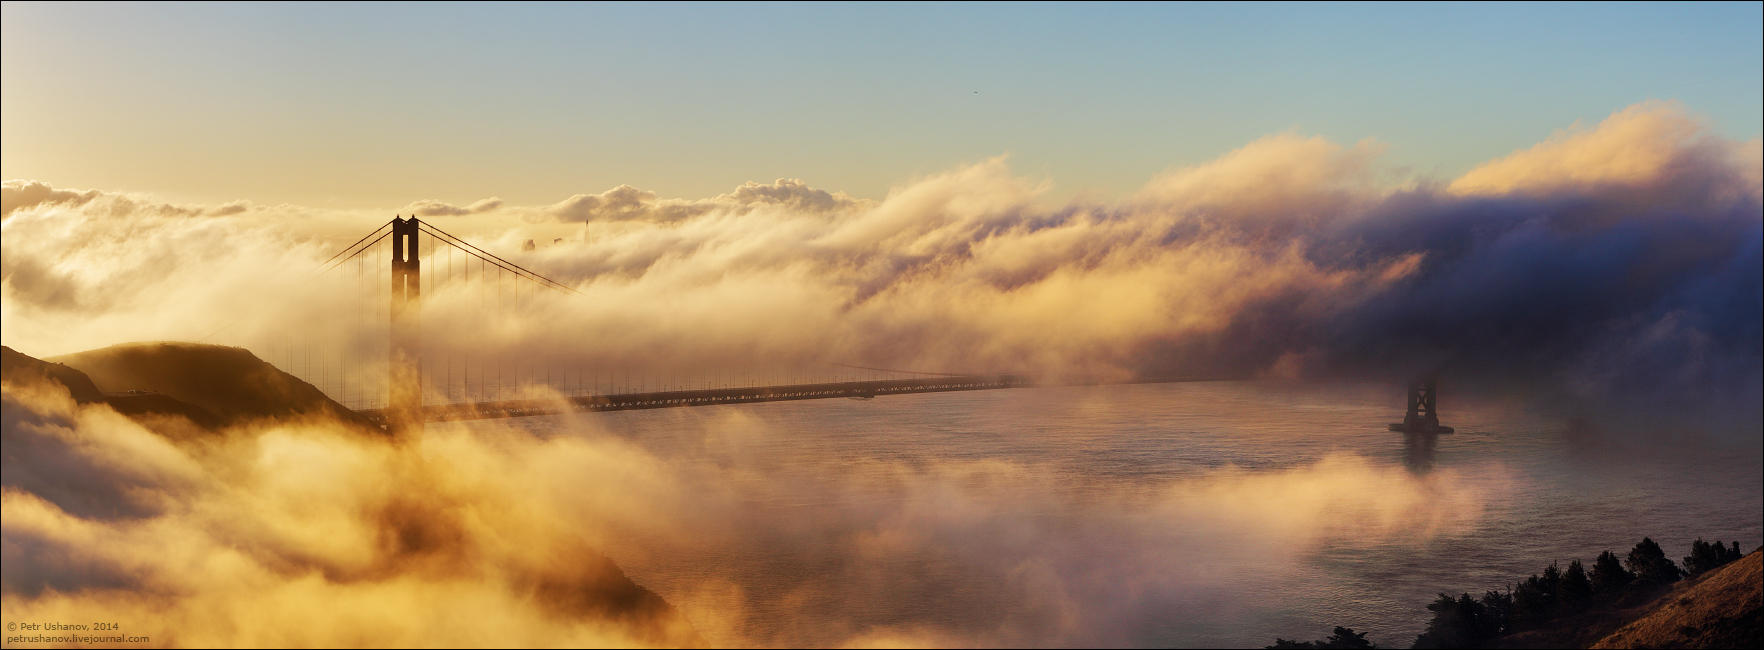 SFpanorama09 Сан Франциско   панорамы города